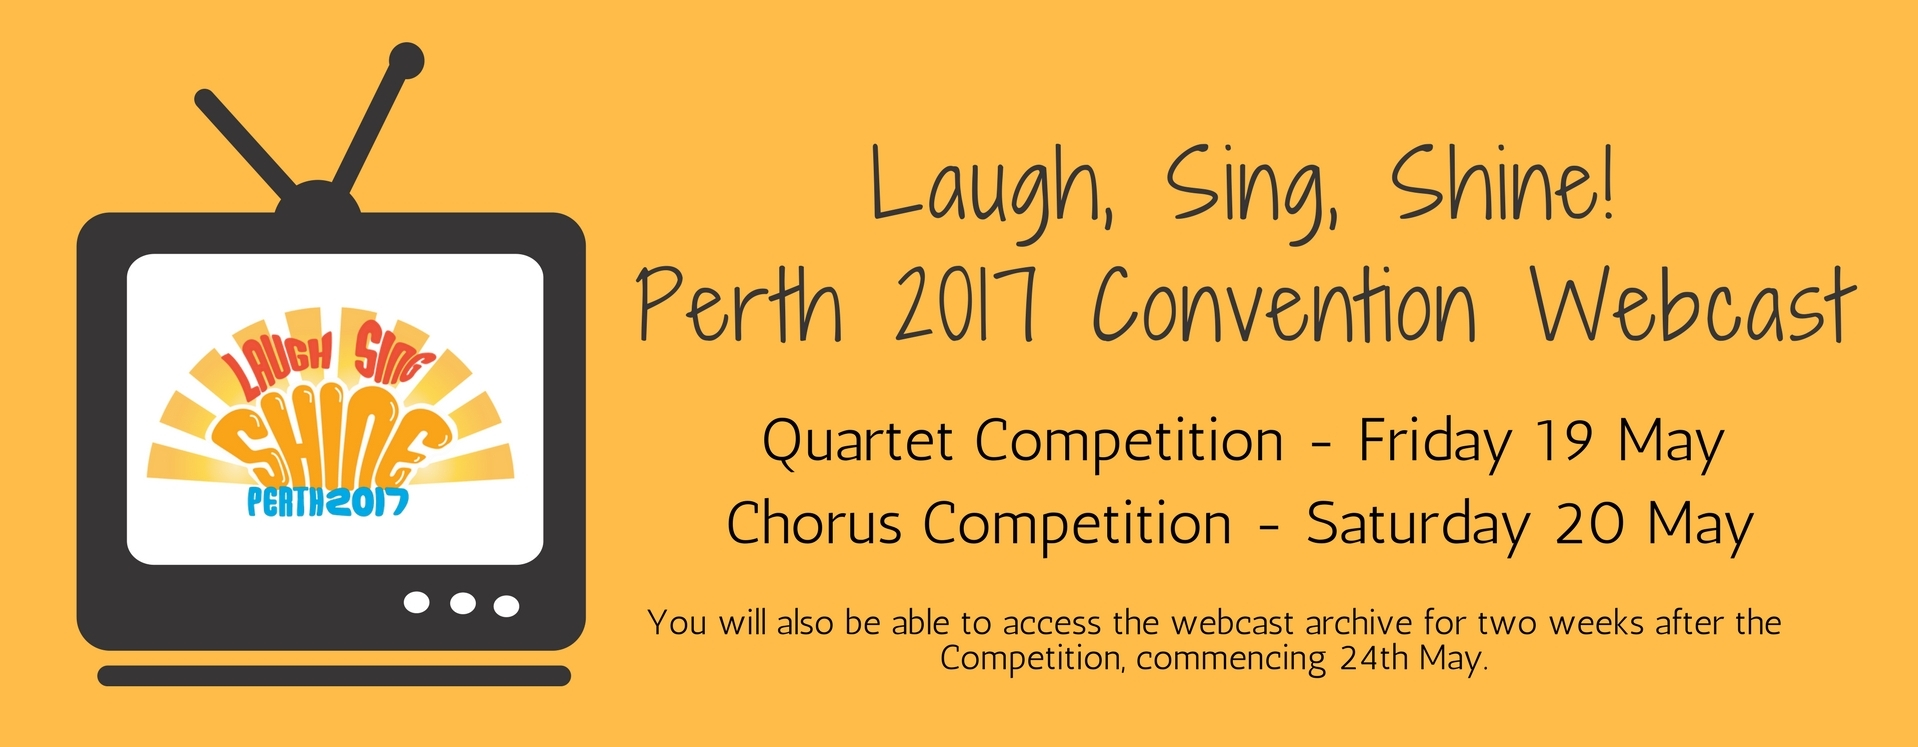 Laugh, Sing, Shine! Perth 2017 Convention Webcast